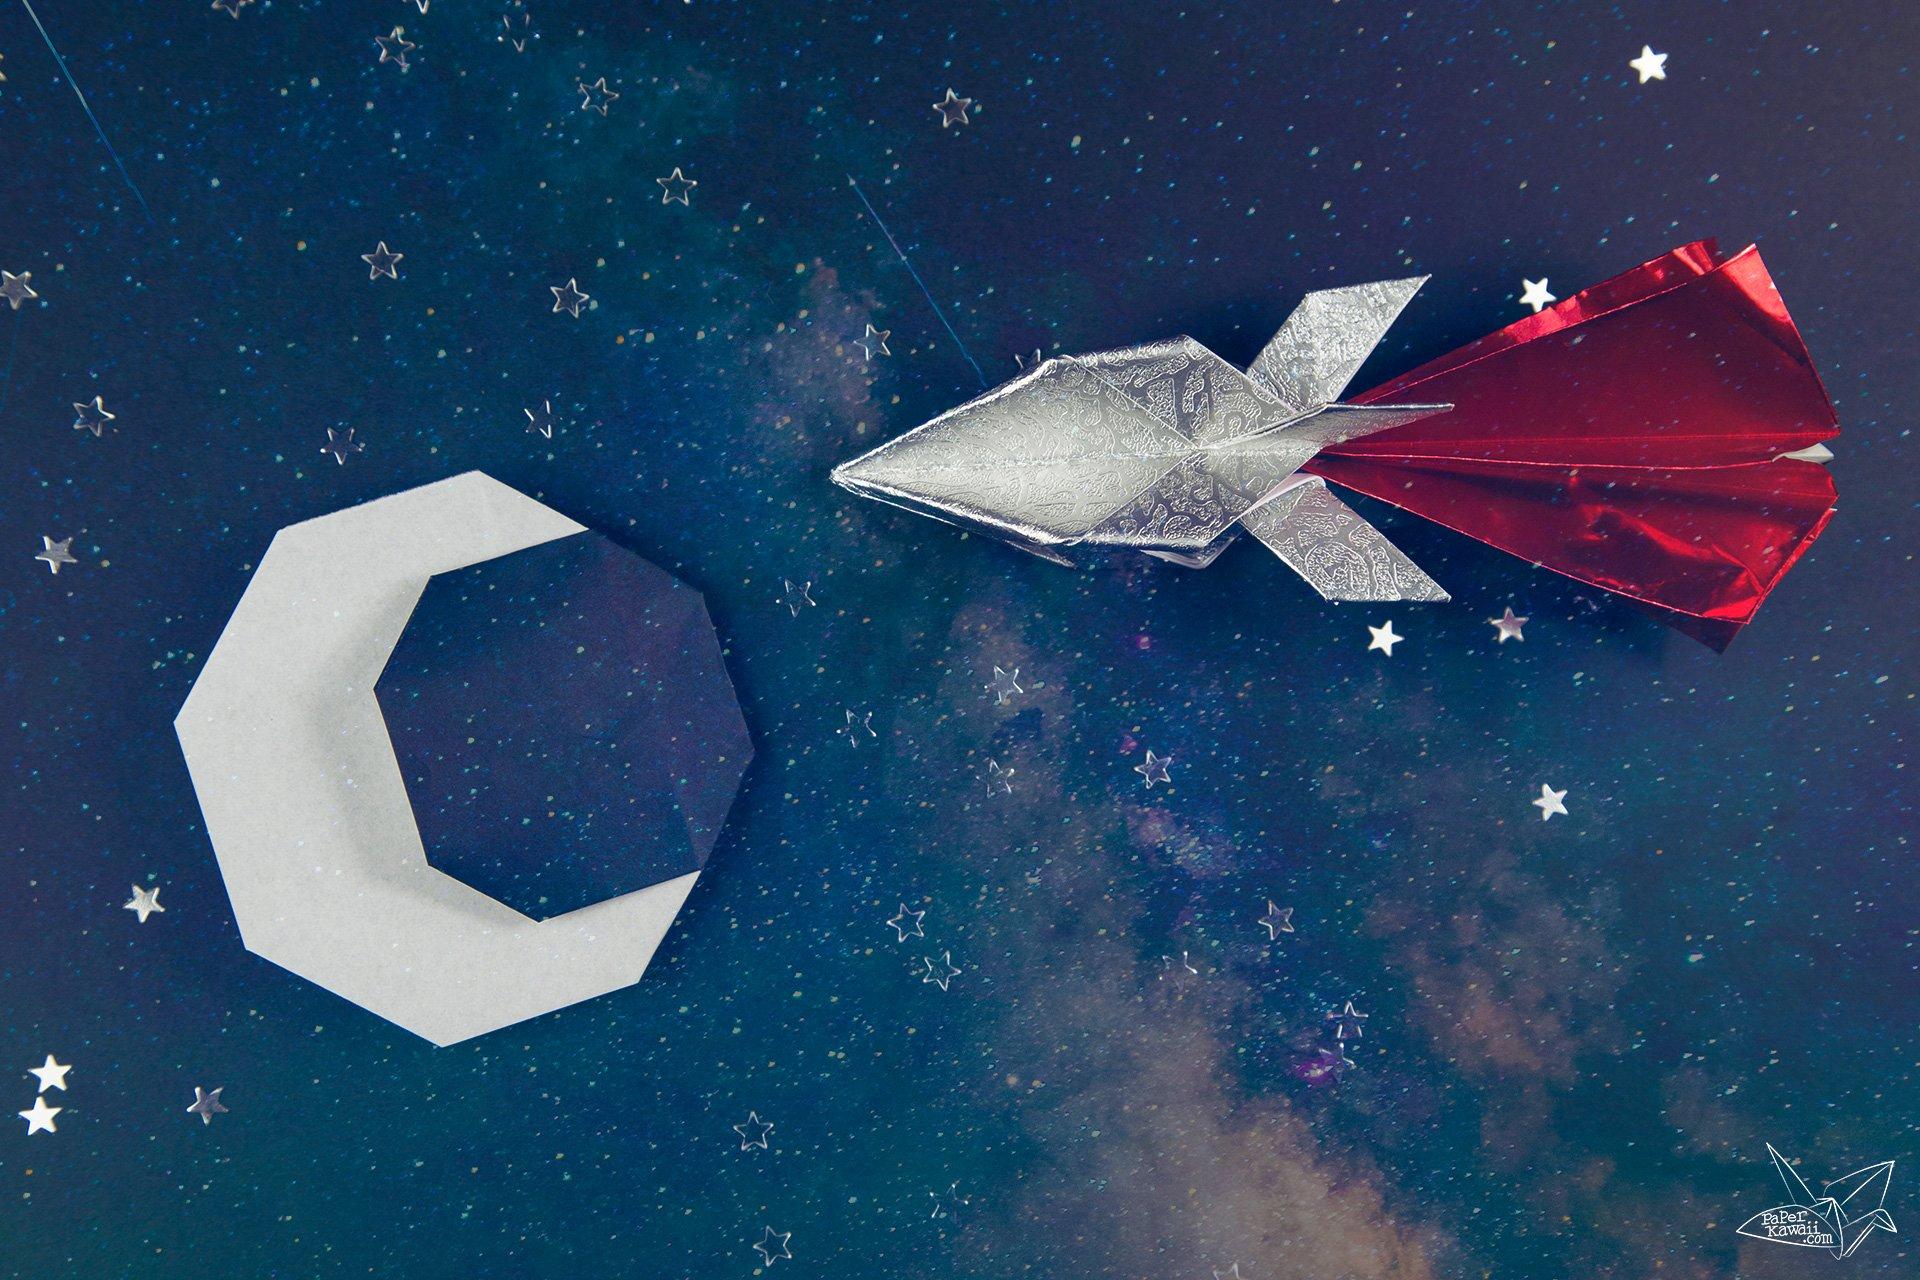 Origami Spaceship Tutorial - Origami Rocket via @paper_kawaii